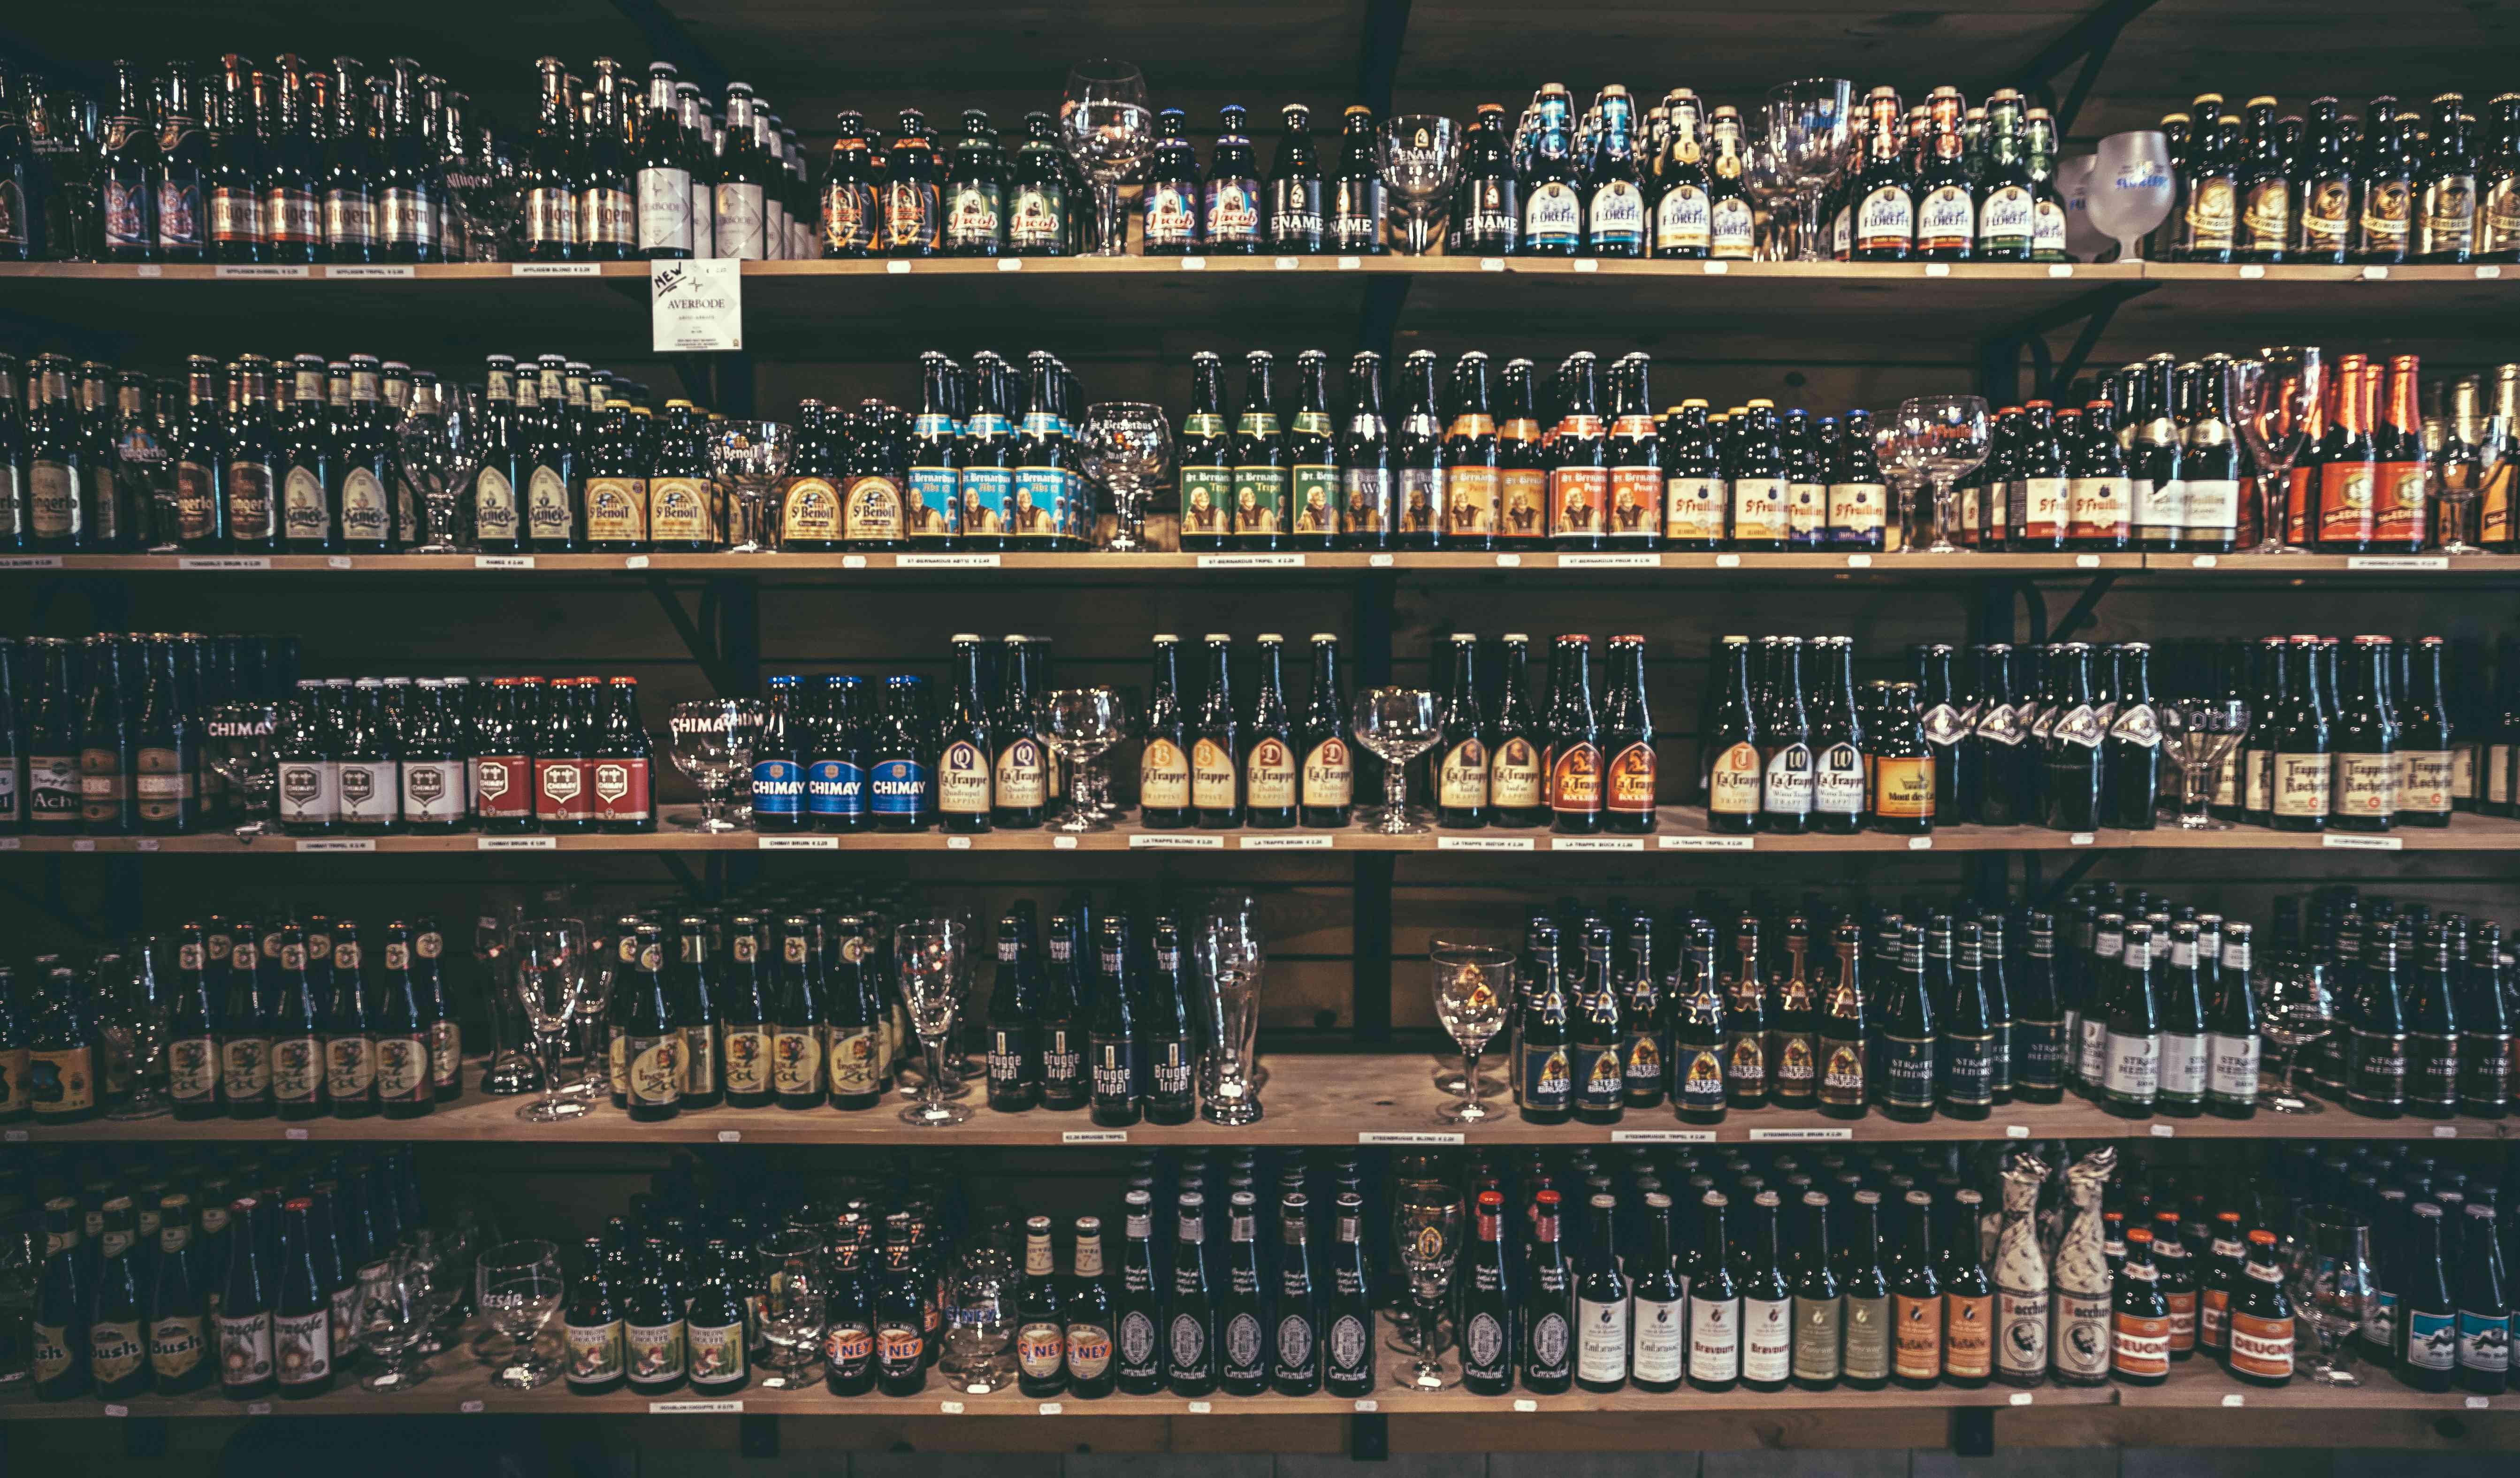 A large variety of Belgium beers